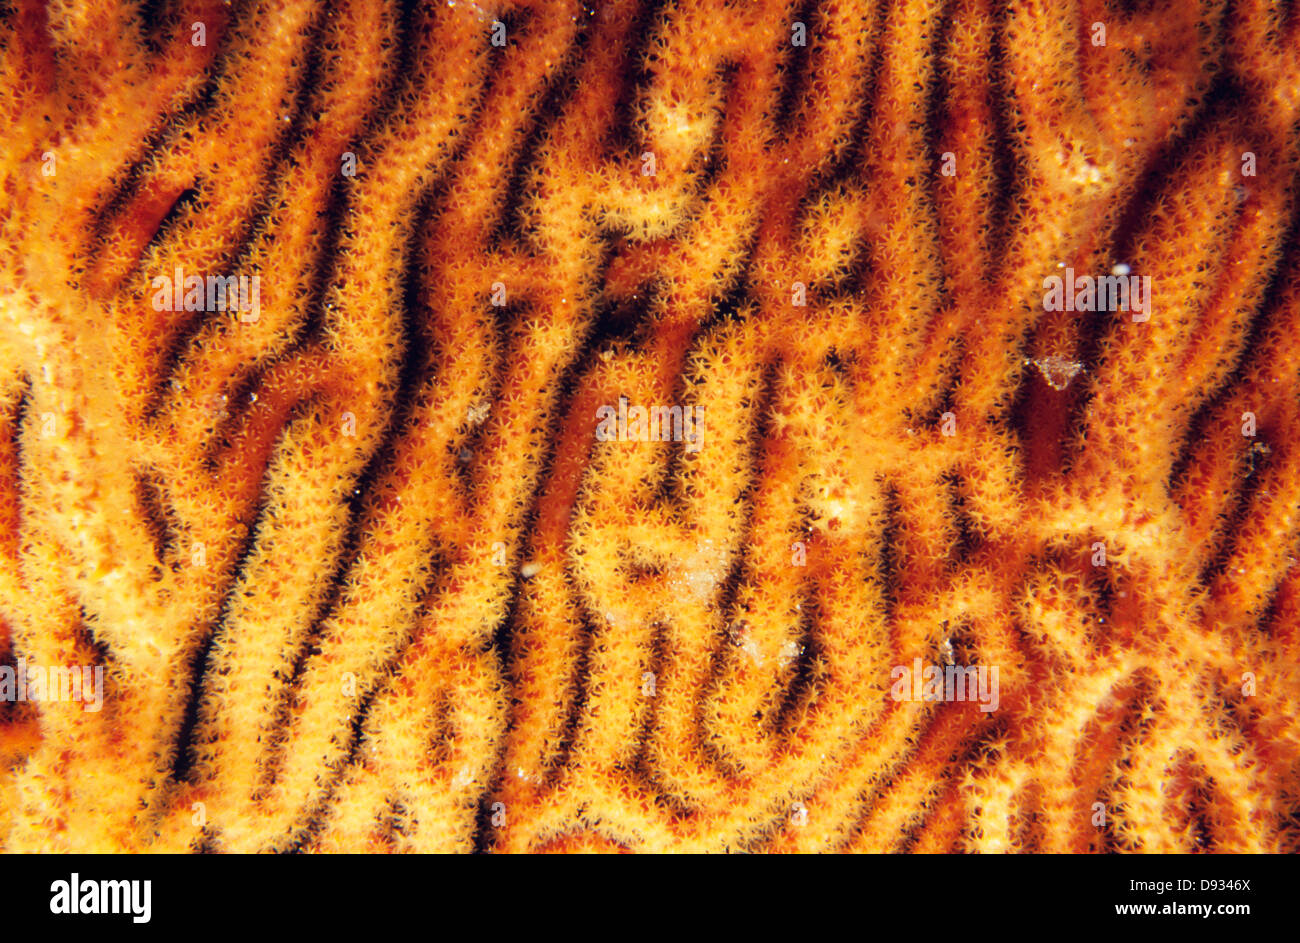 Algae, close-up - Stock Image